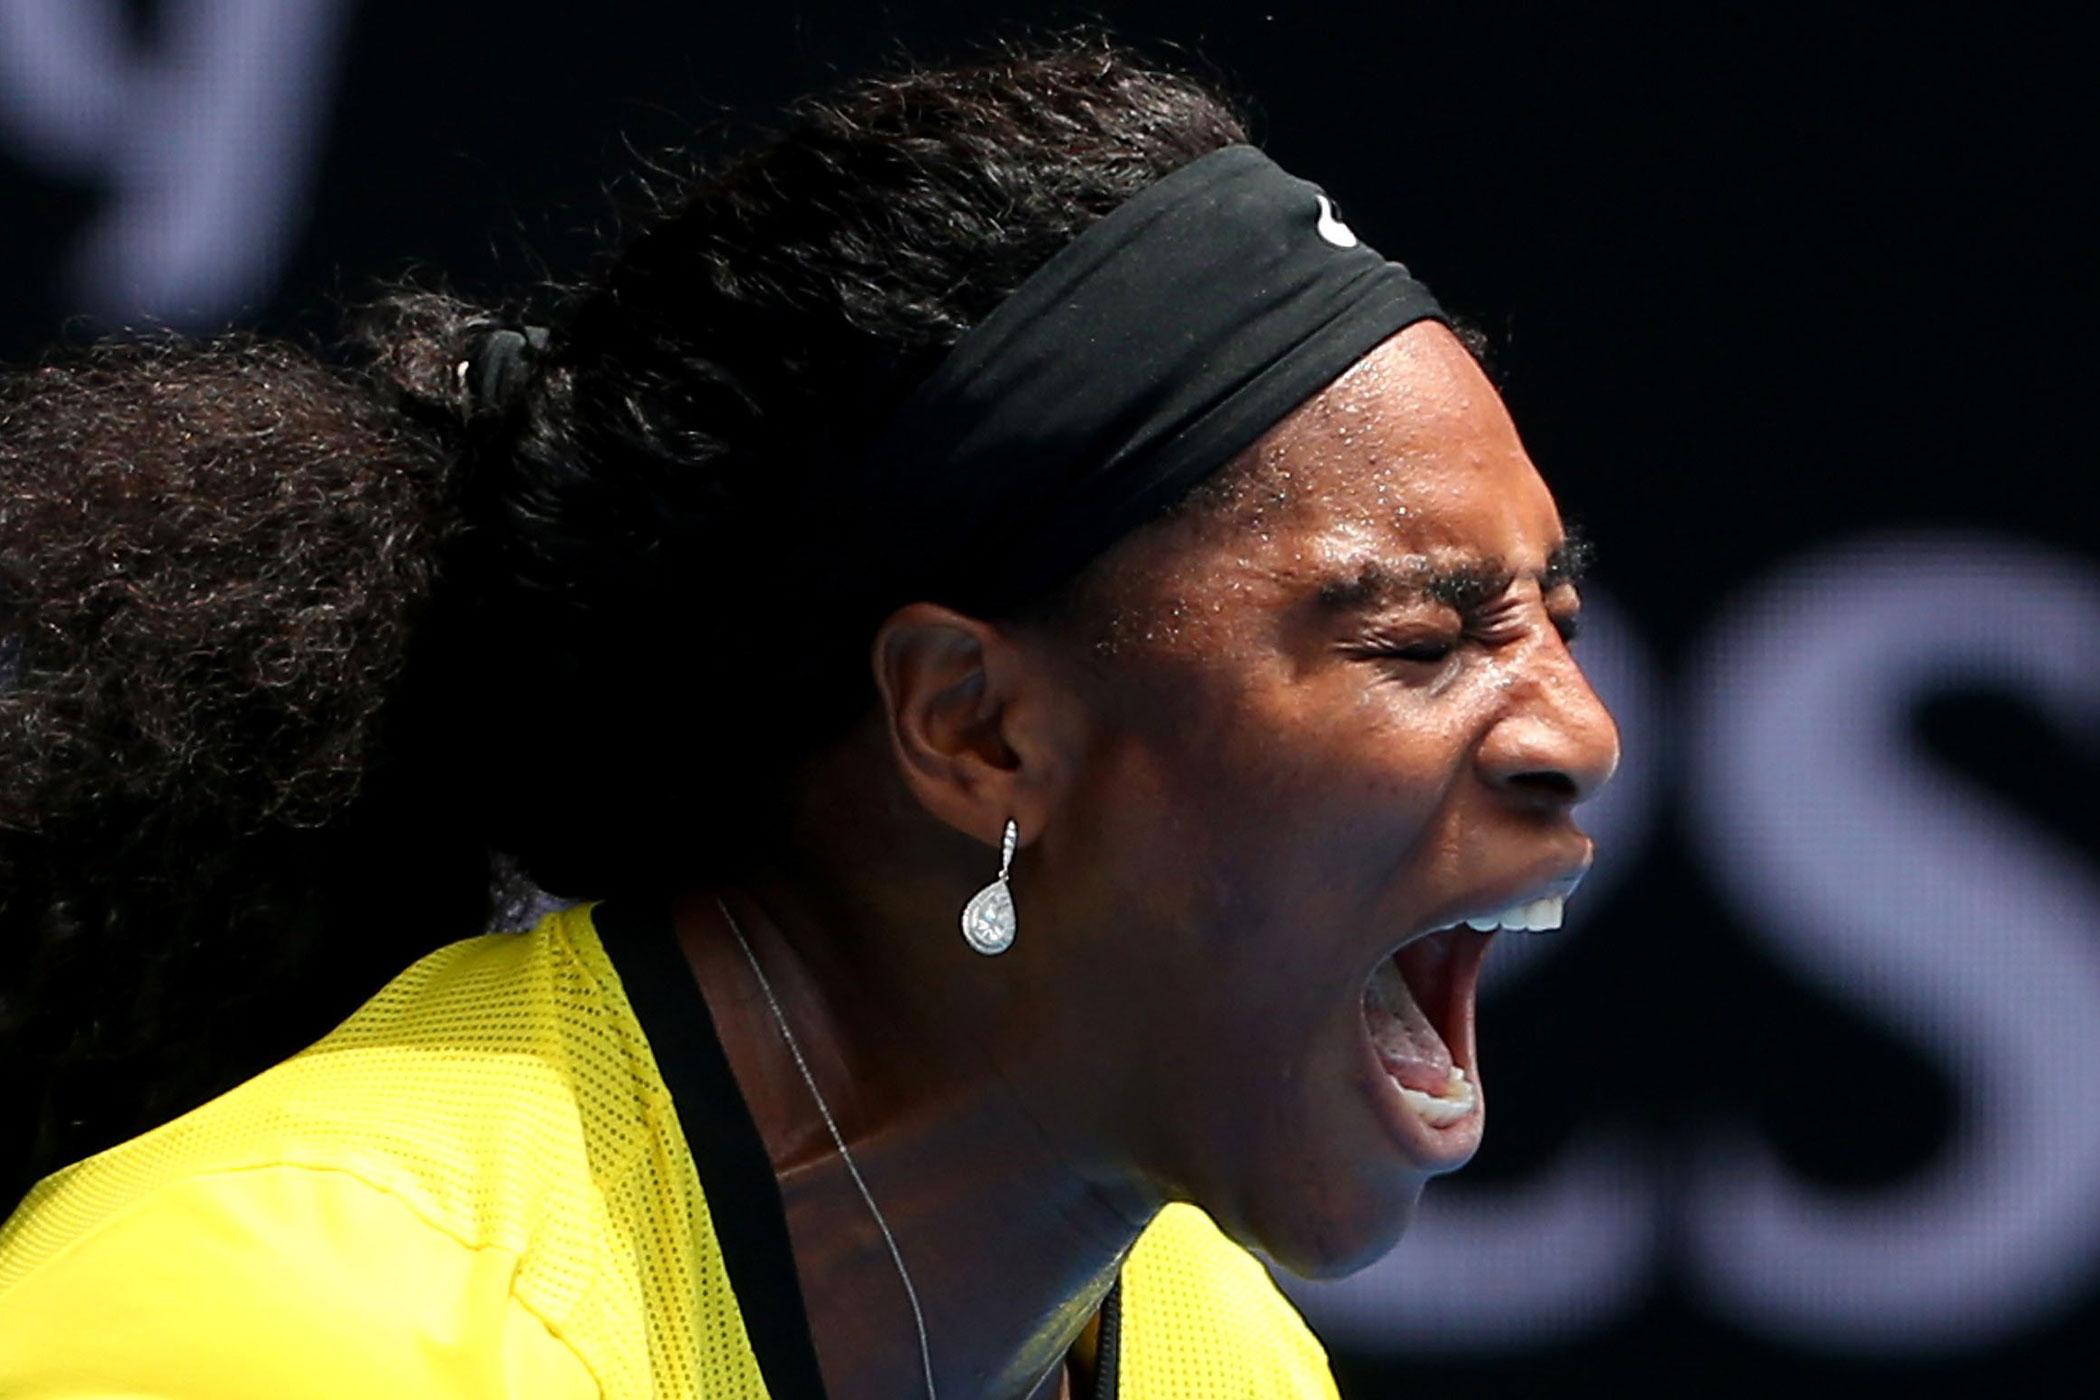 Serena Williams celebrates a point in her quarter final match against Russia's Maria Sharapova on Jan. 26.